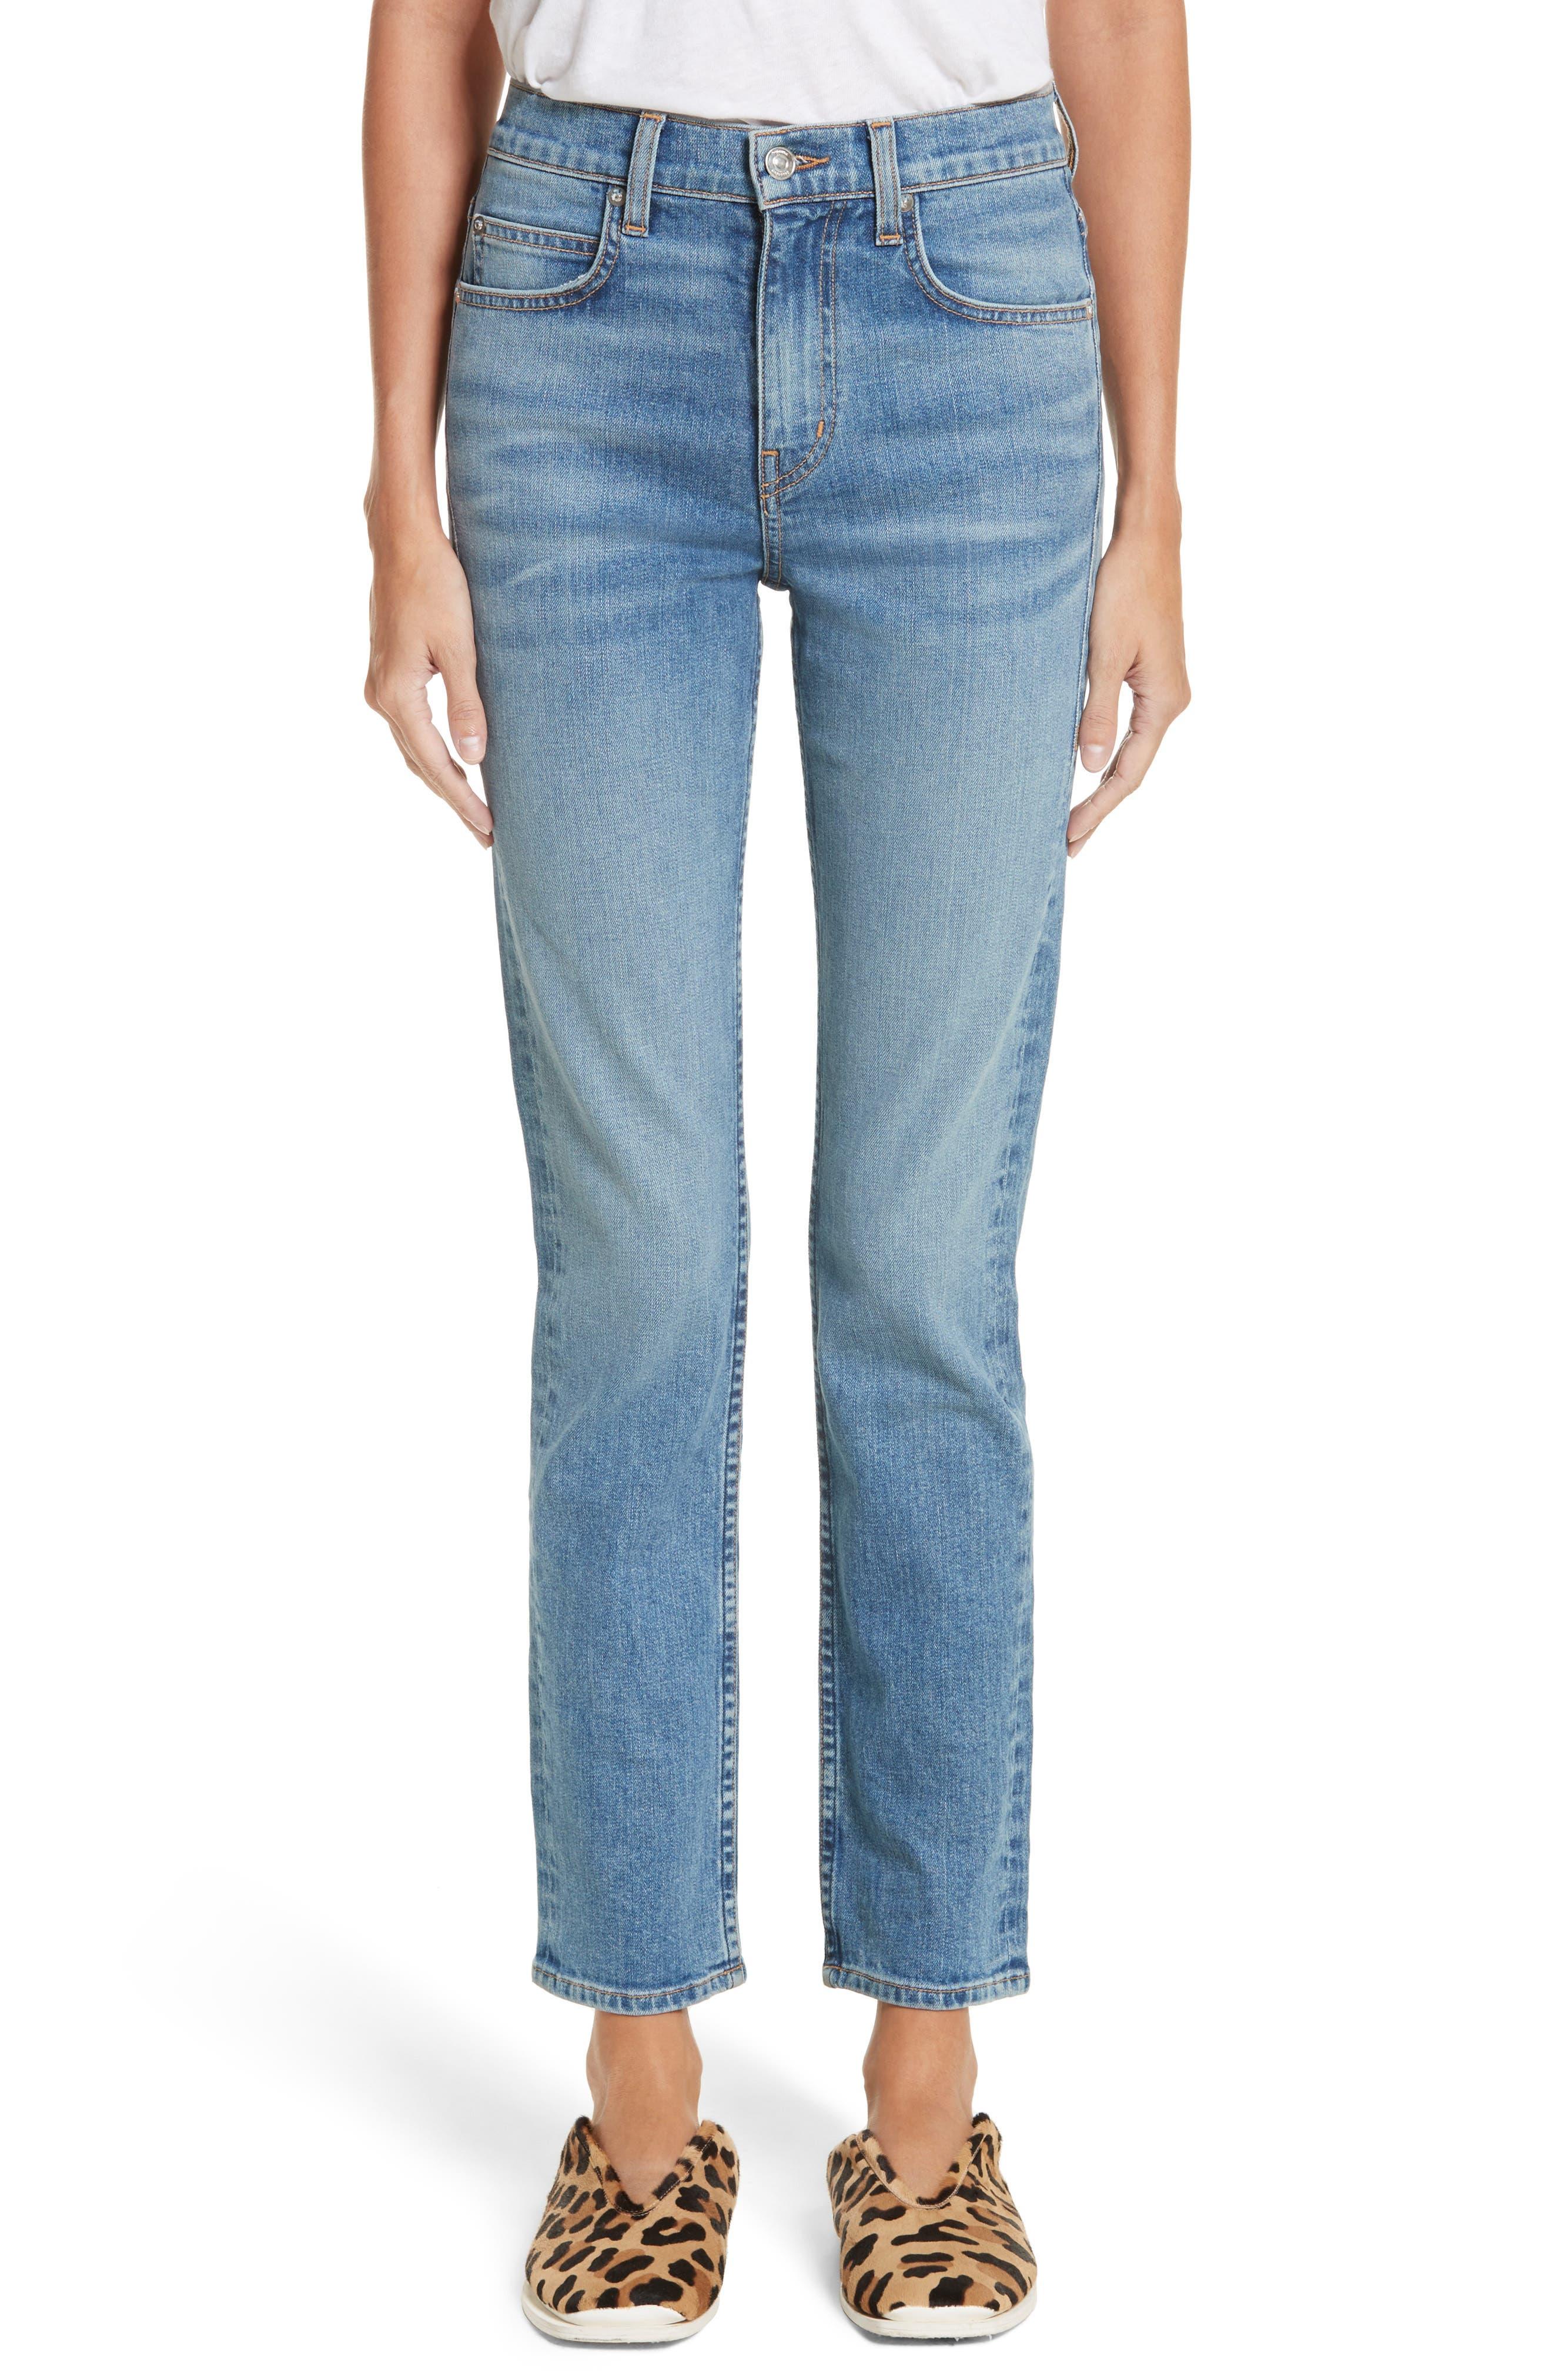 PSWL Straight Leg Jeans,                         Main,                         color, Medium Blue